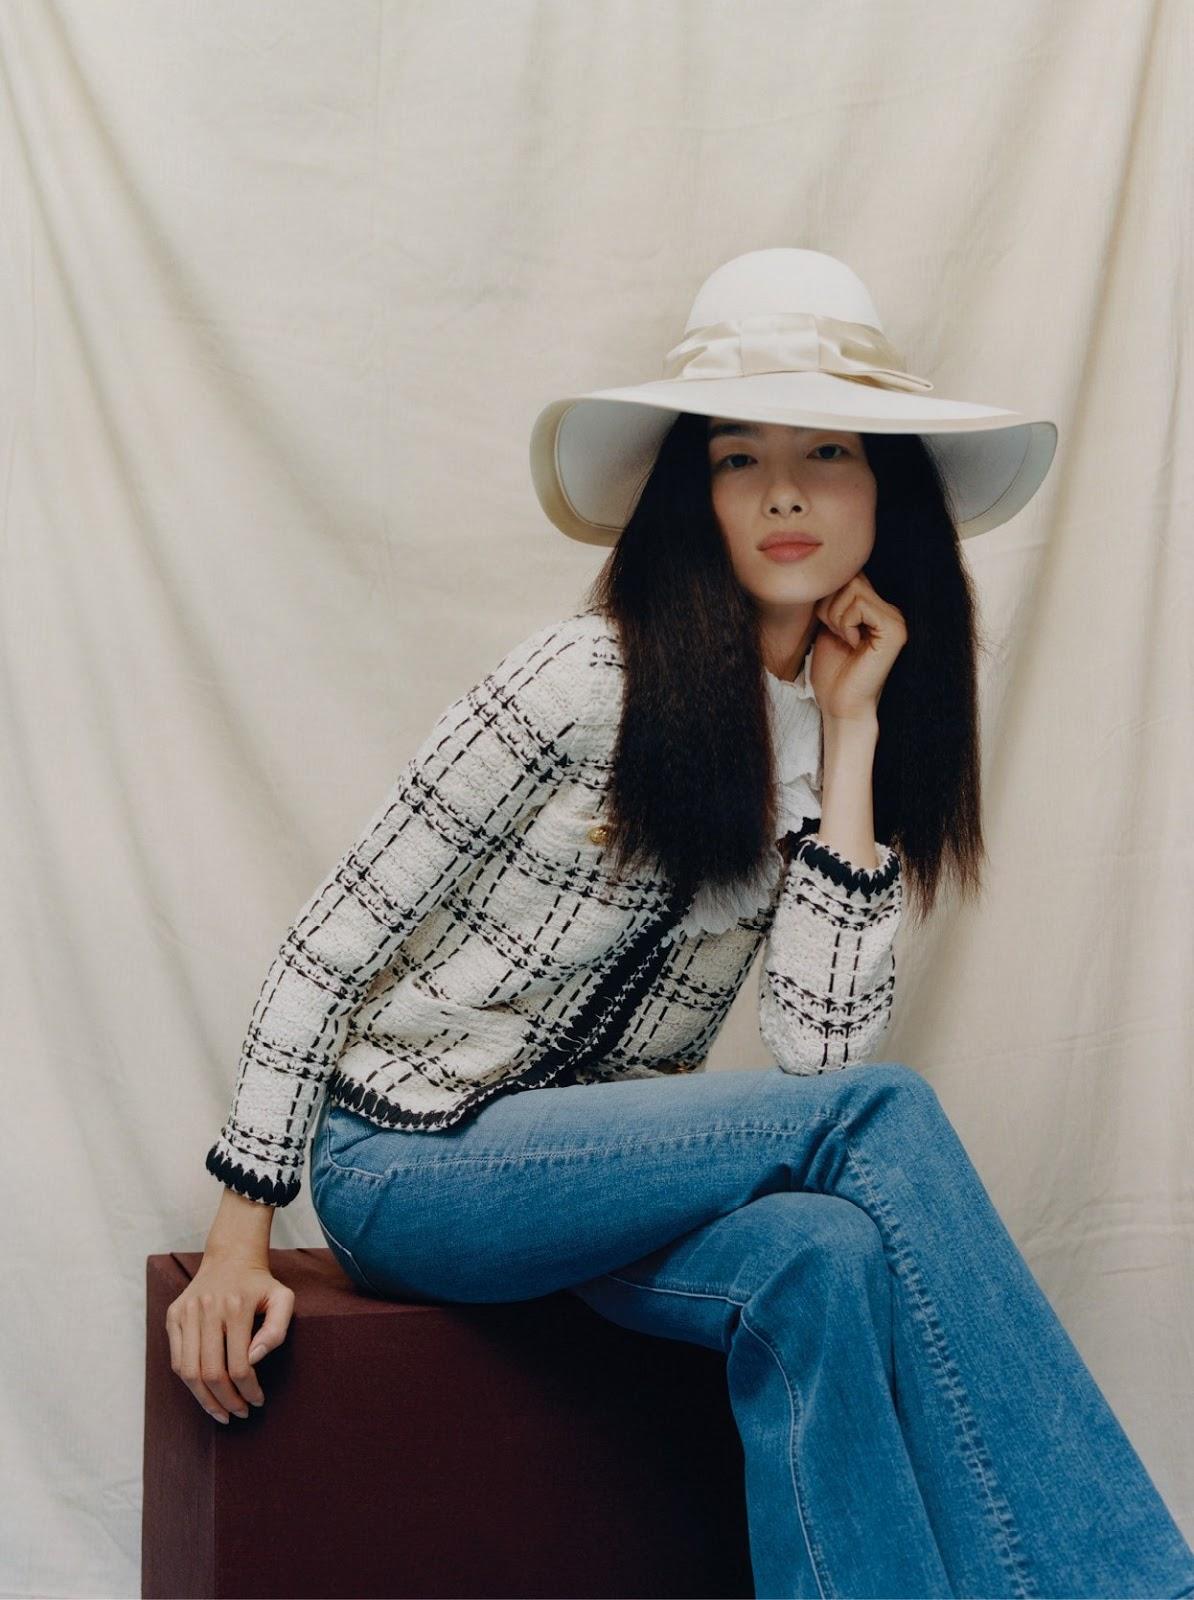 Fei Fei Sun - Tory Burch cardigan. Mother jeans. Gucci hat